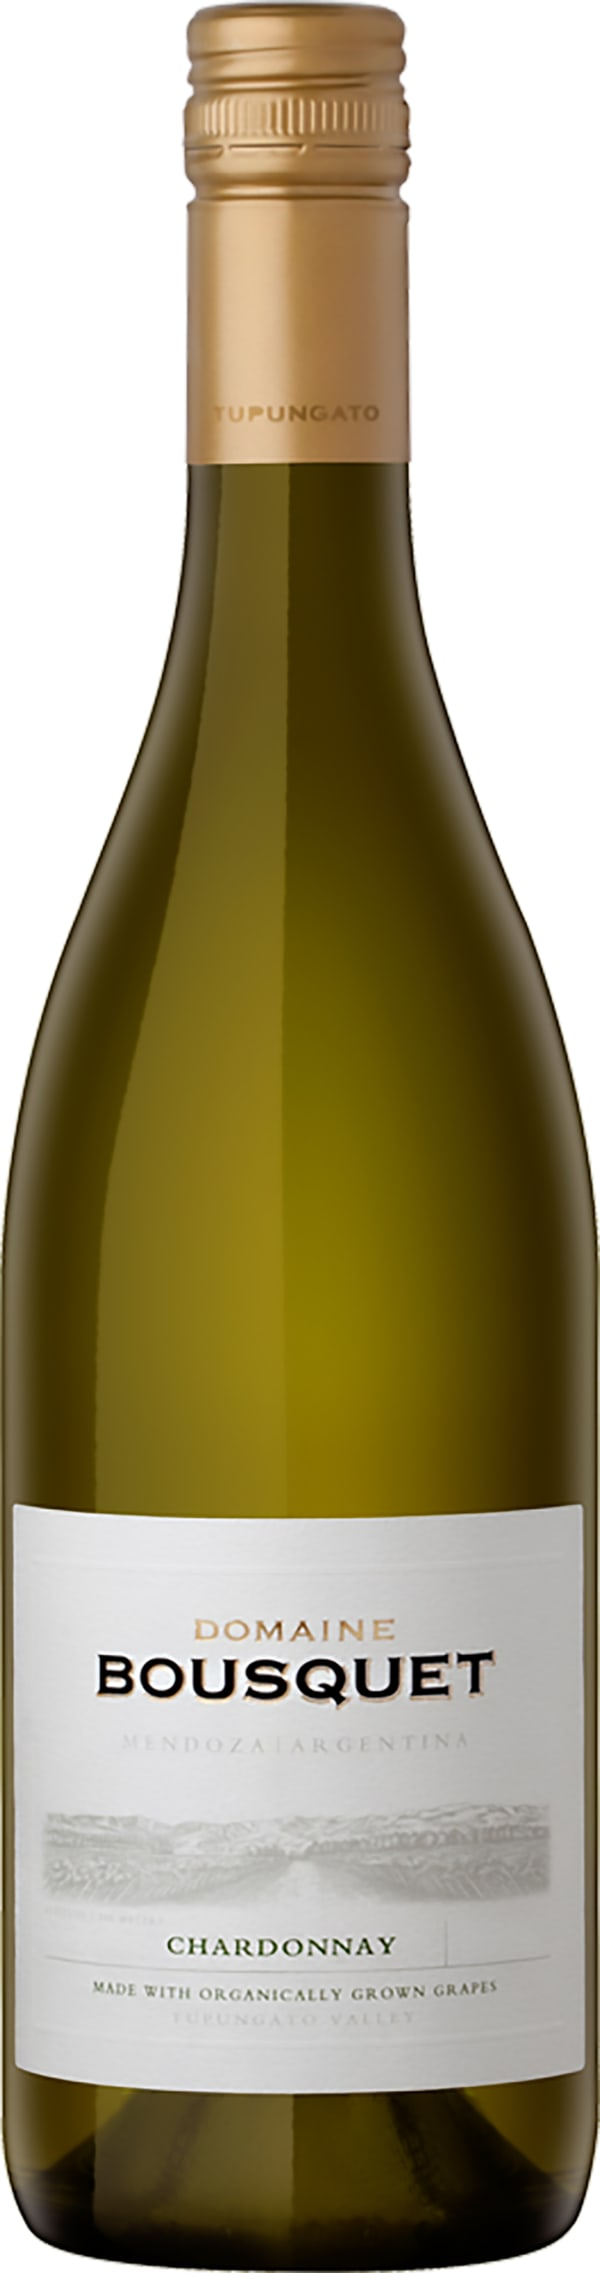 Domaine Bousquet Chardonnay Organic 2017